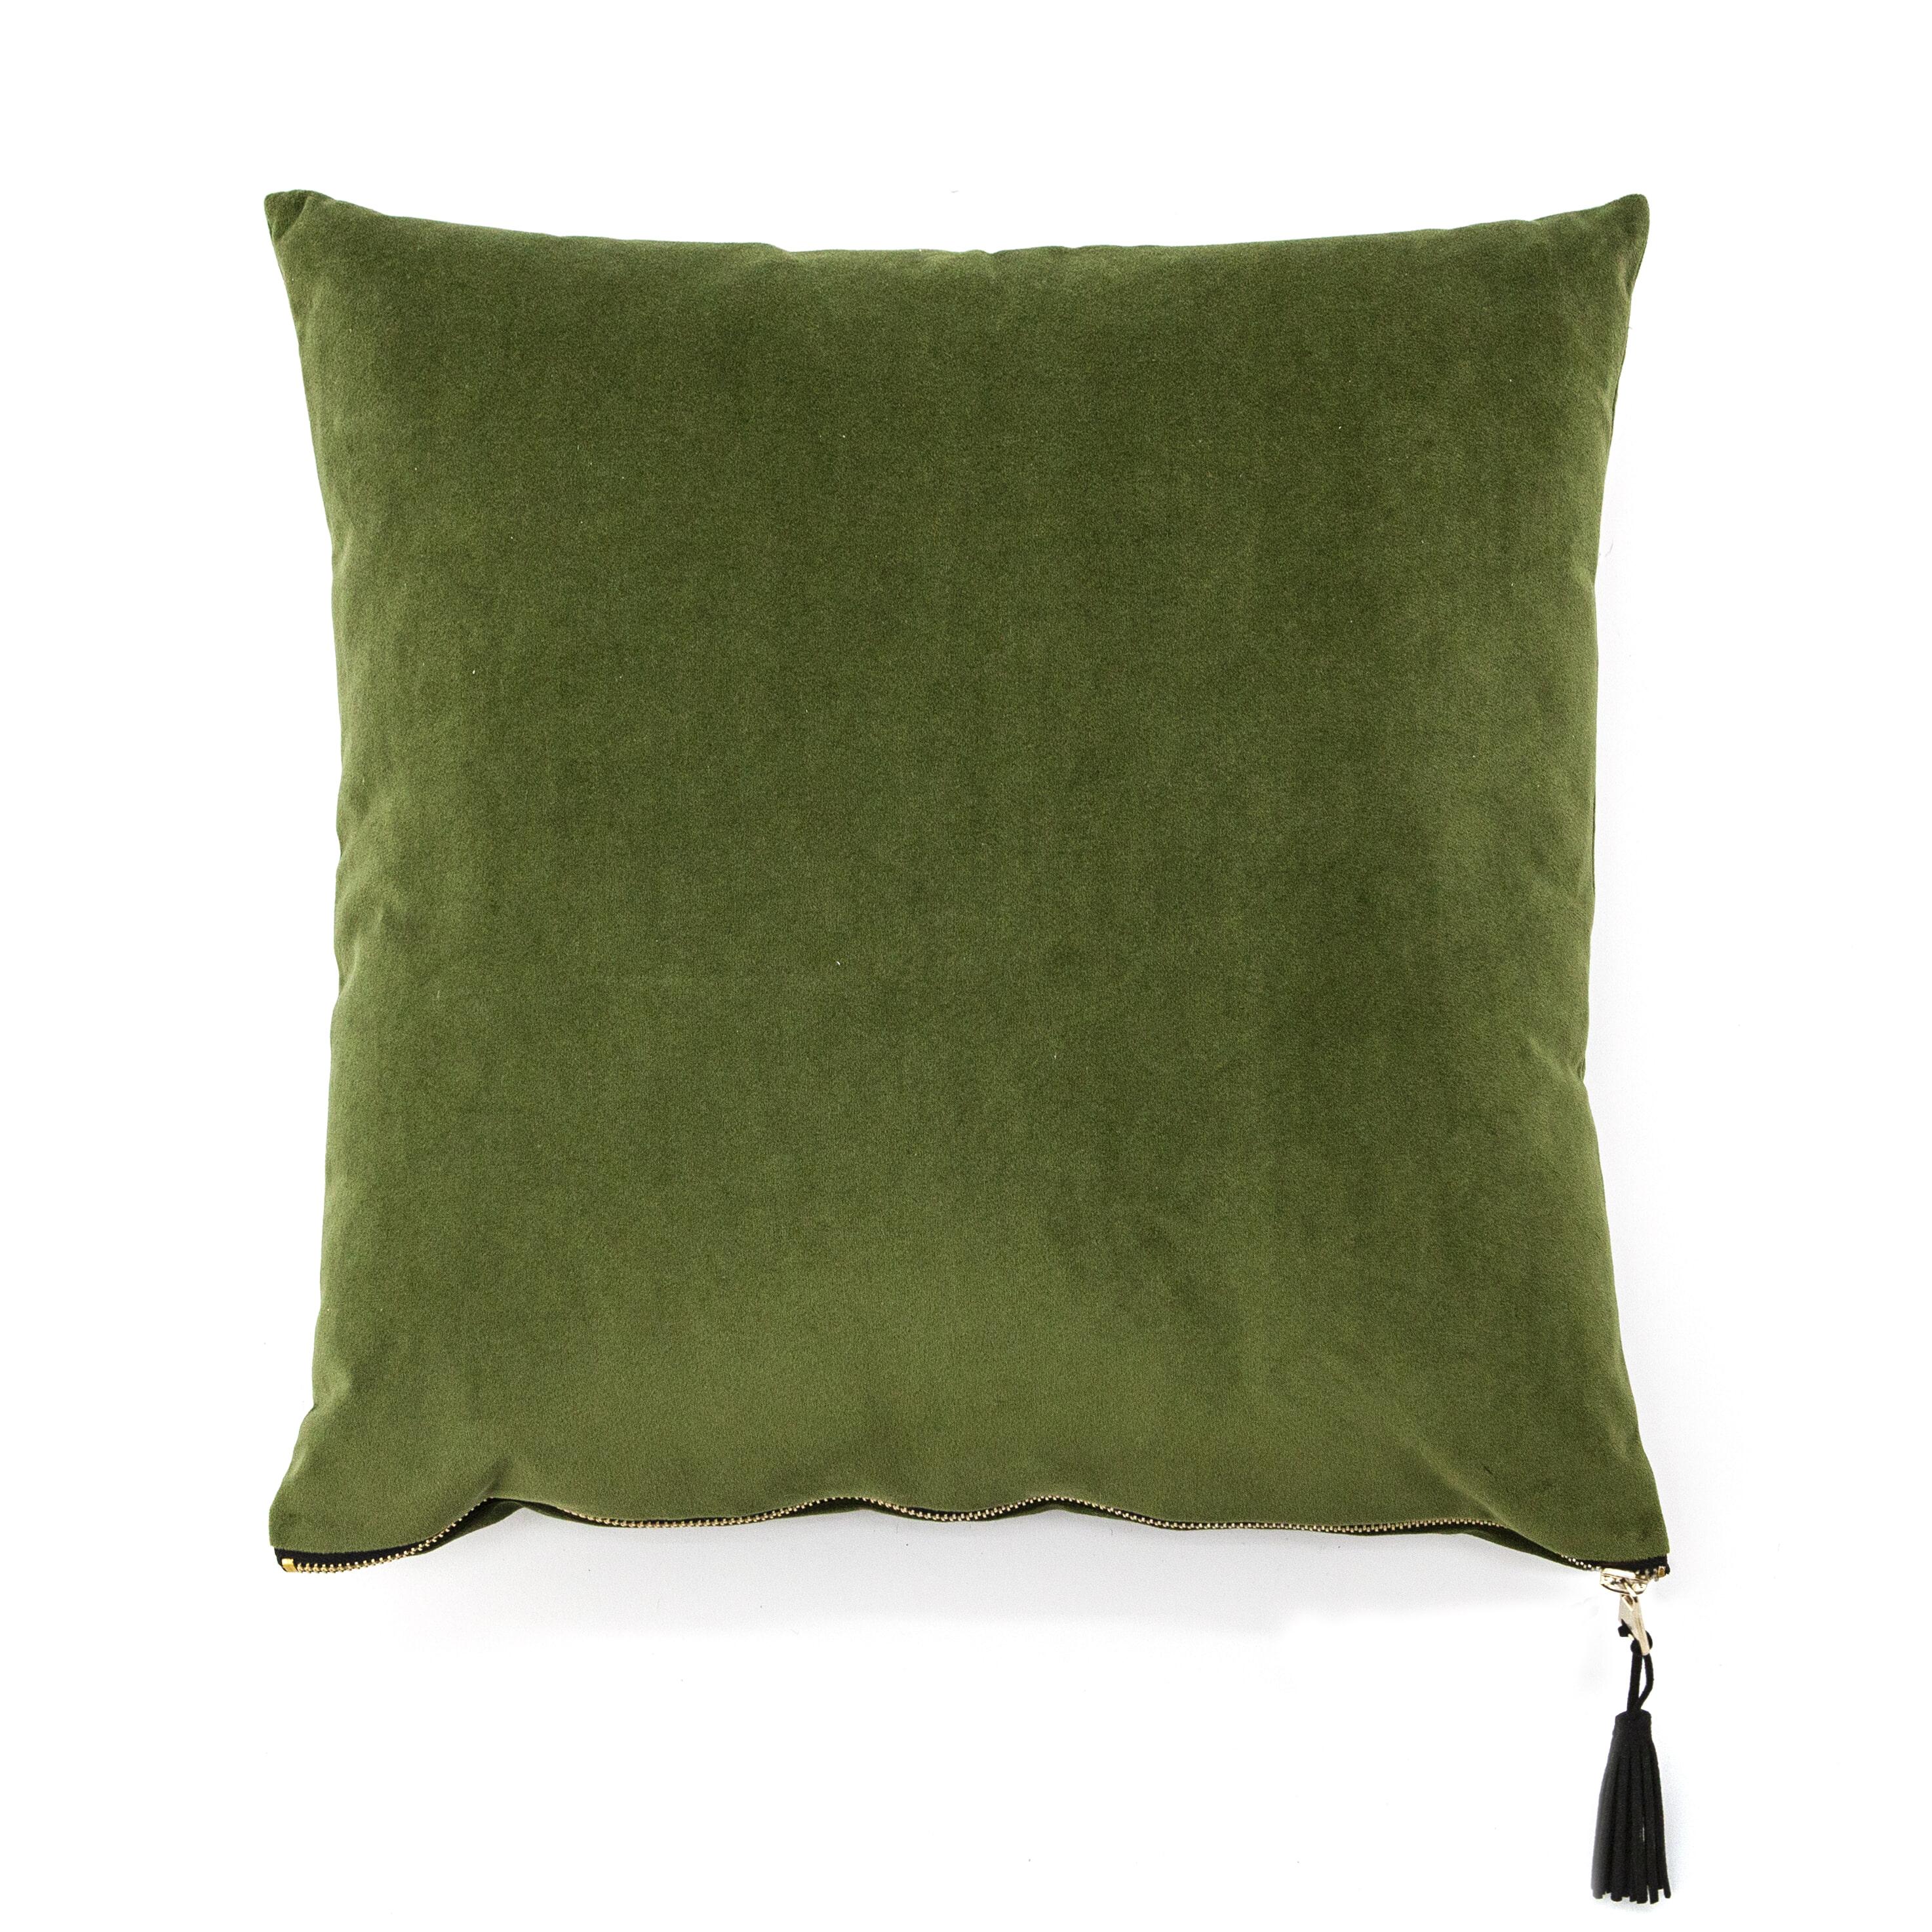 By-Boo Kussen 'Stuart' 45 x 45cm, kleur Groen